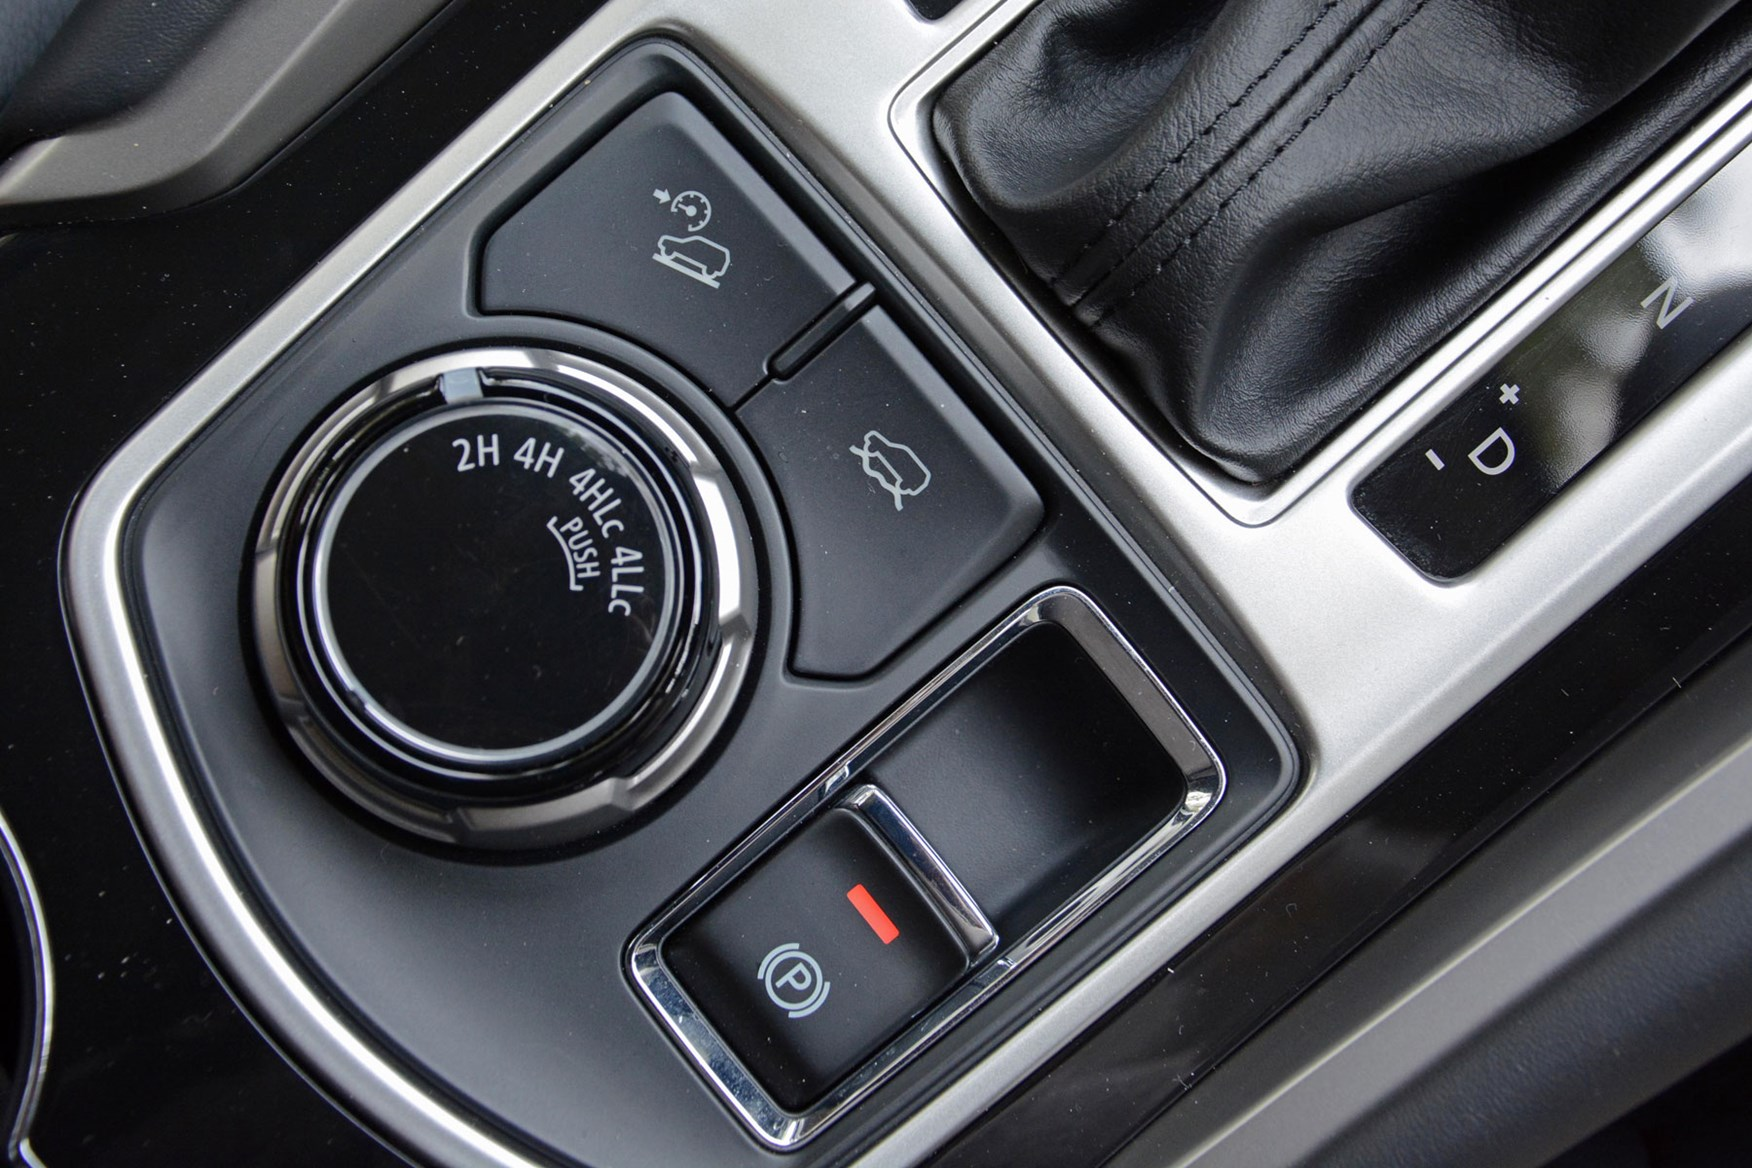 Mitsubishi Shogun Sport Commercial 4x4 van review - four-wheel drive selector